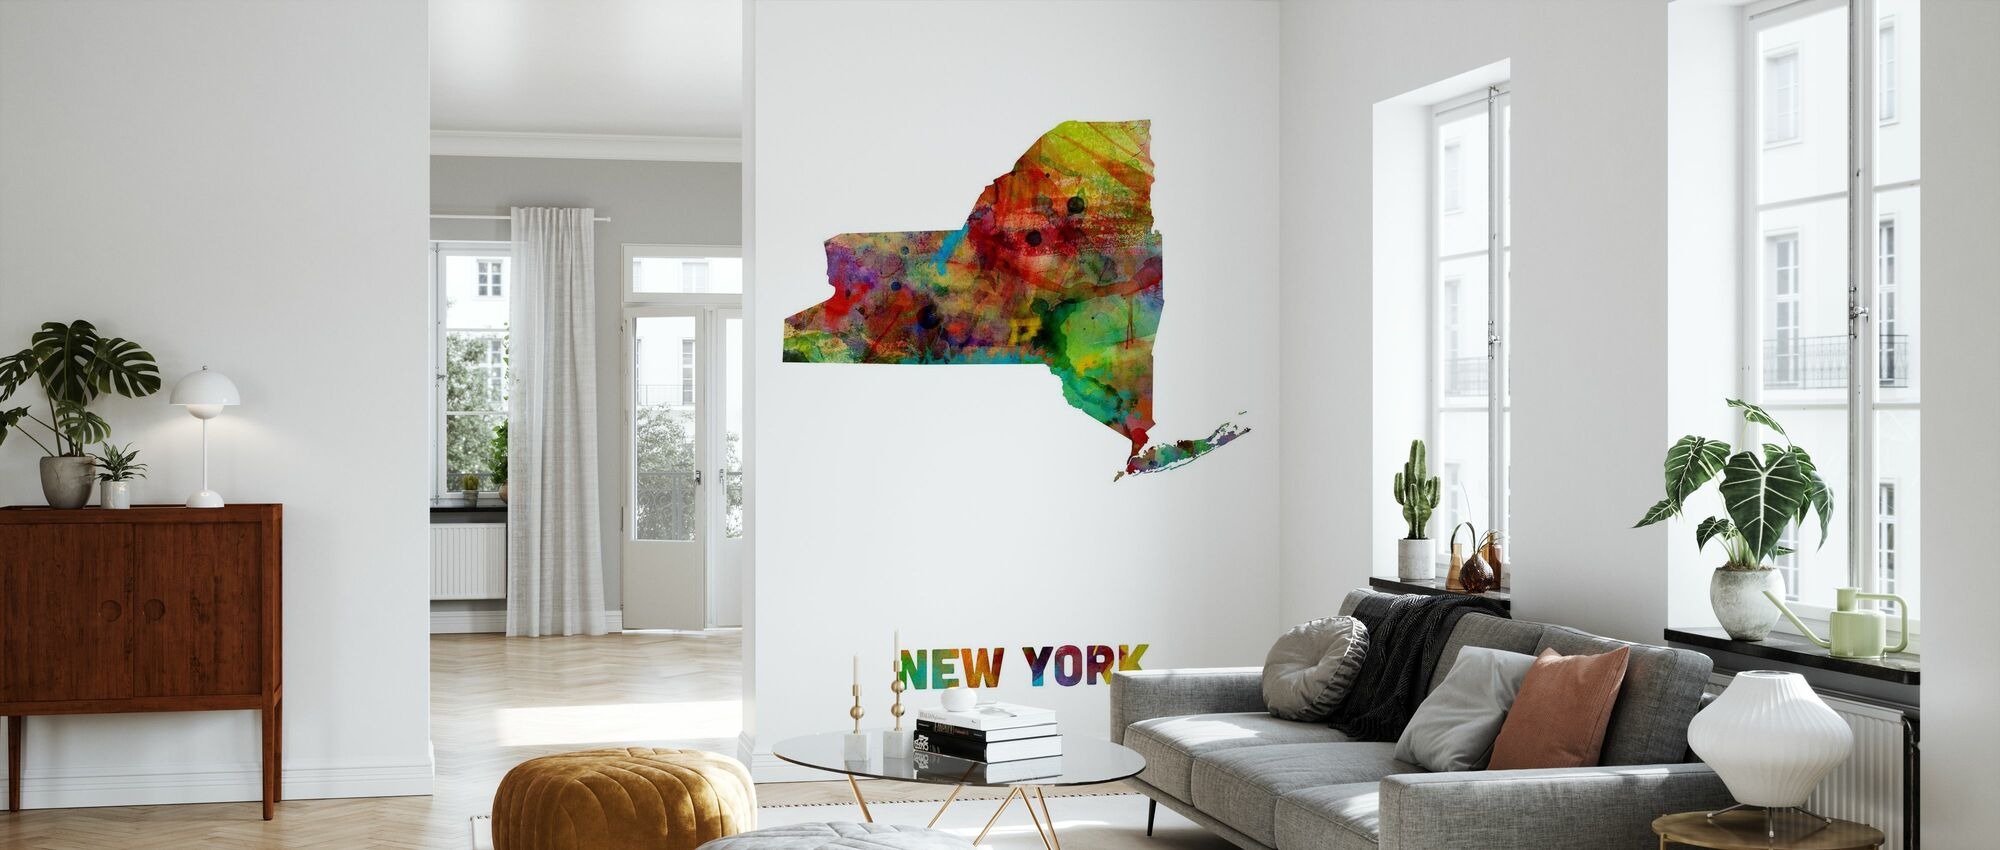 New York State Map - Wallpaper - Living Room